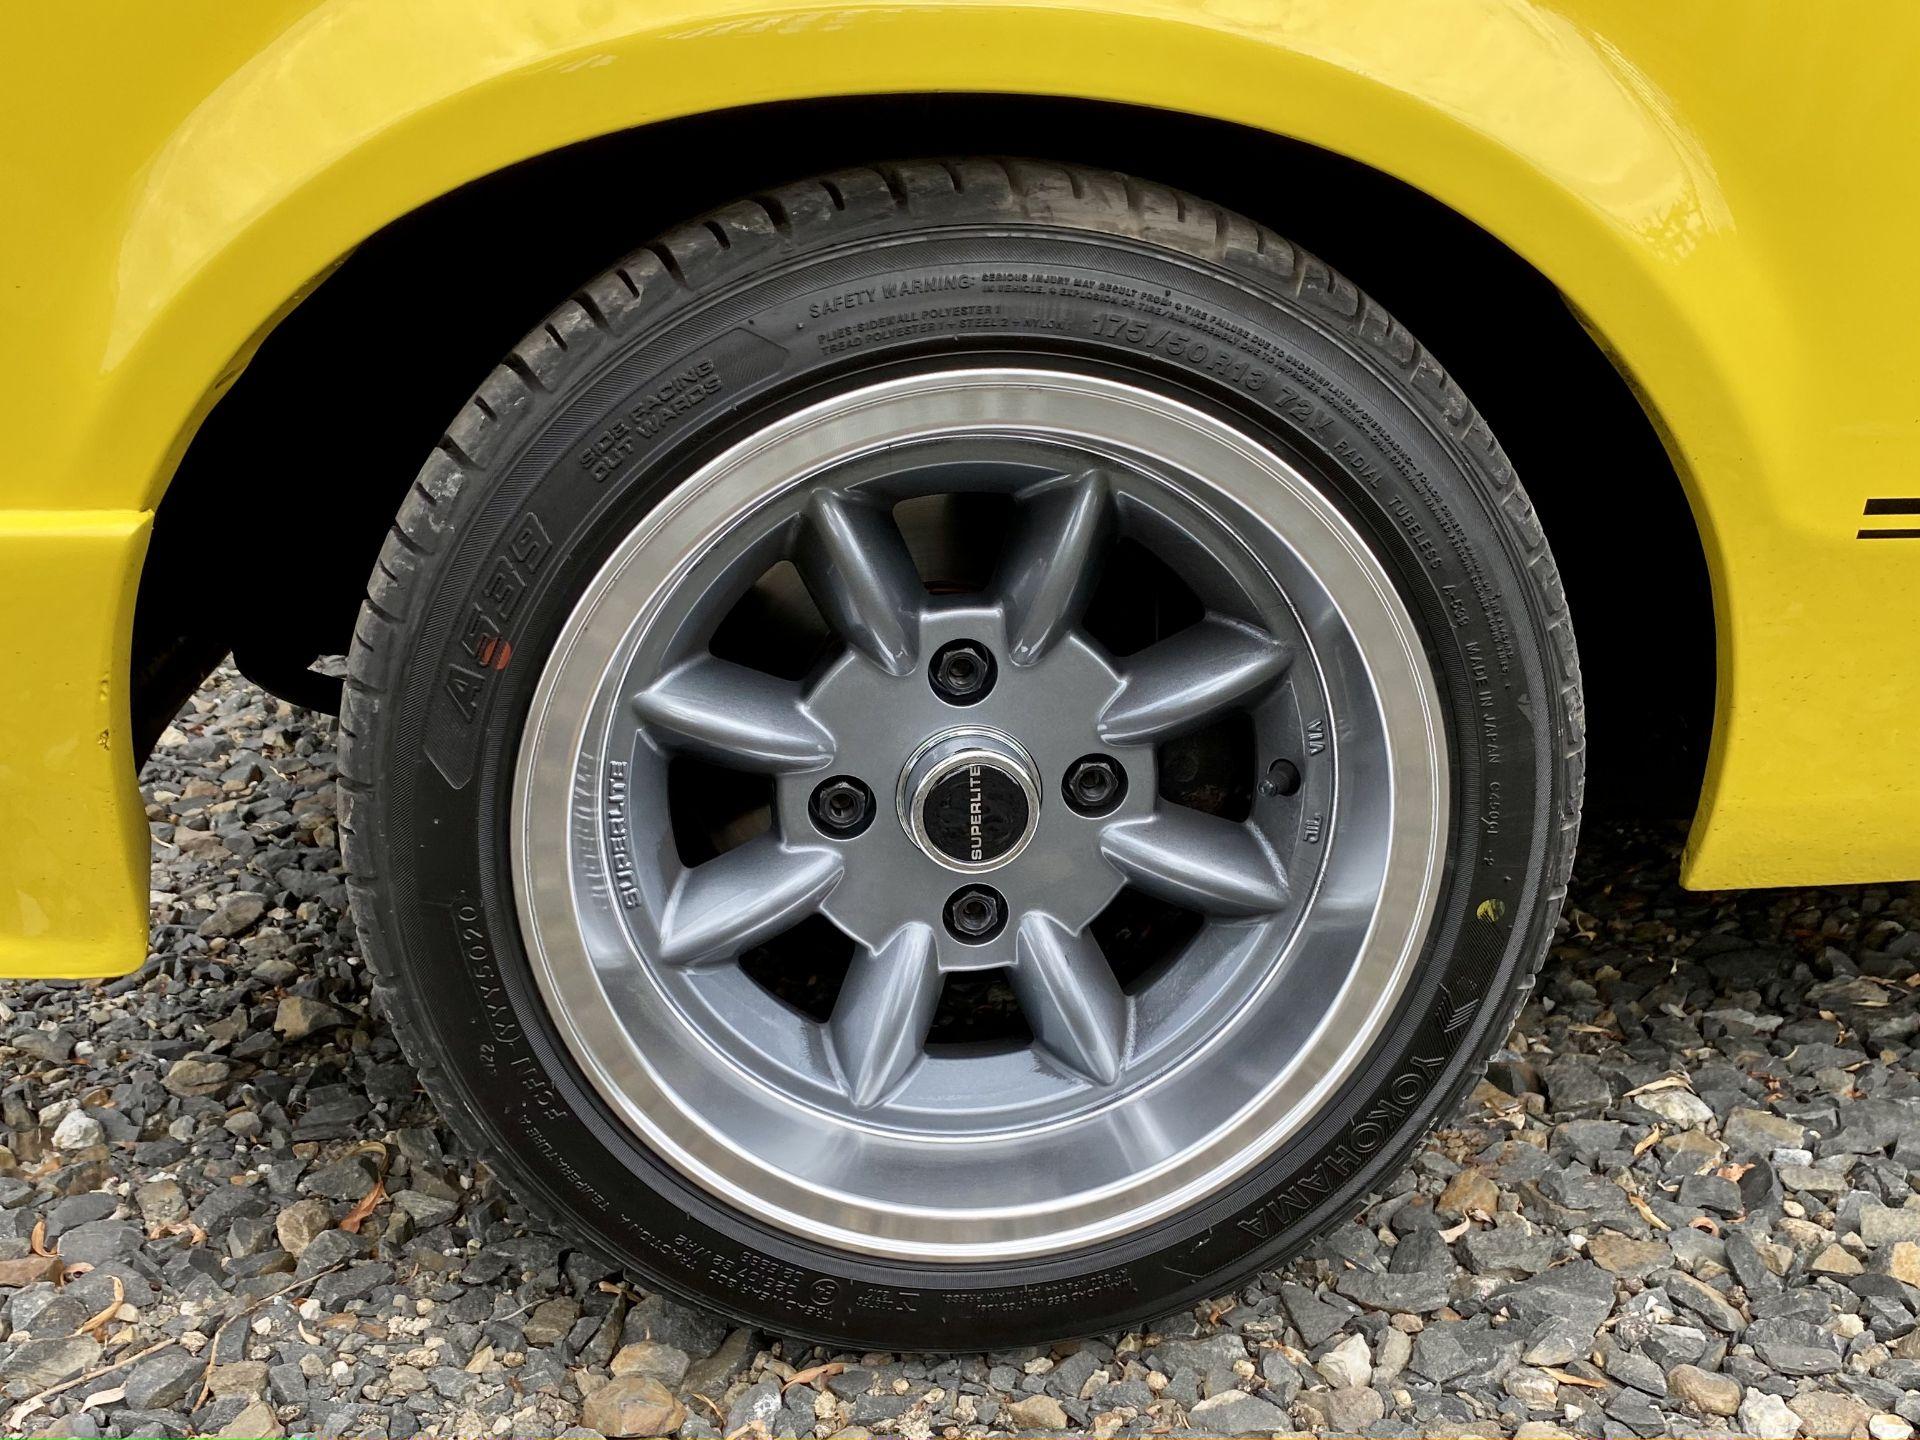 Ford Escort MK2 - Image 25 of 58